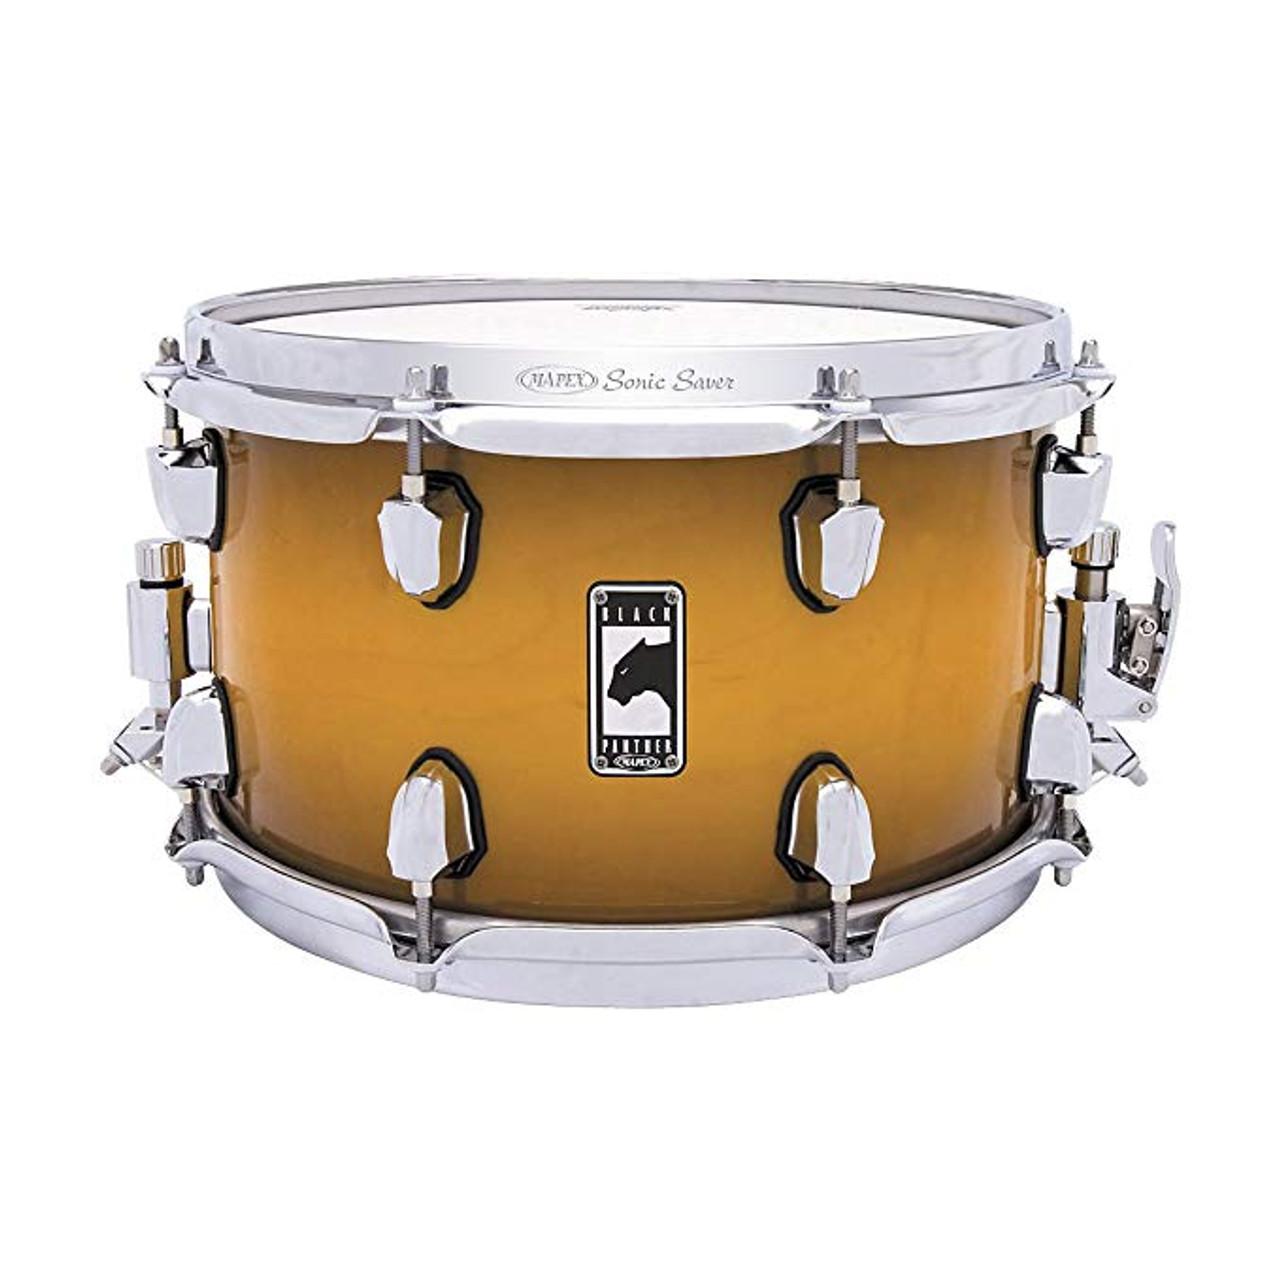 Mapex Fastback Snare Drum 12x7